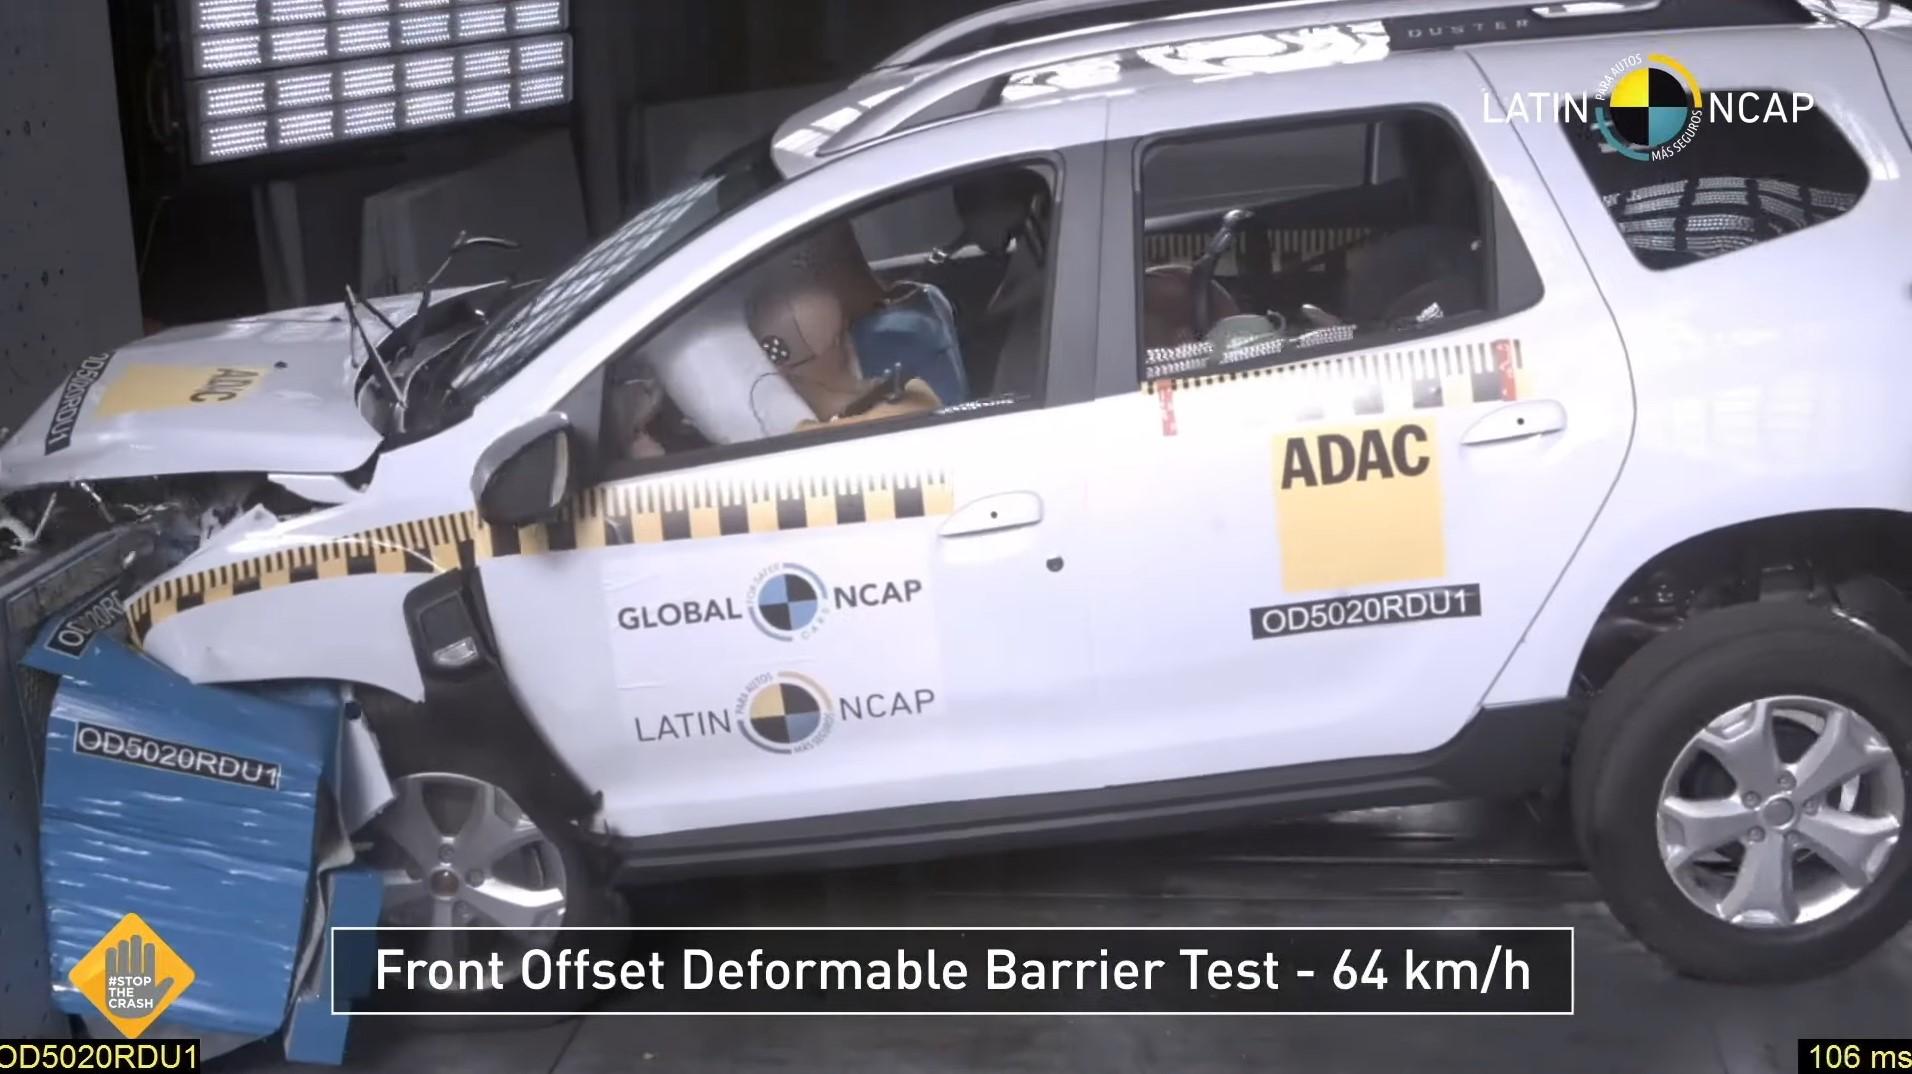 Renault Duster 2022 получил 0 звезд в краш-тесте Latin NCAP в 2021 году на видео